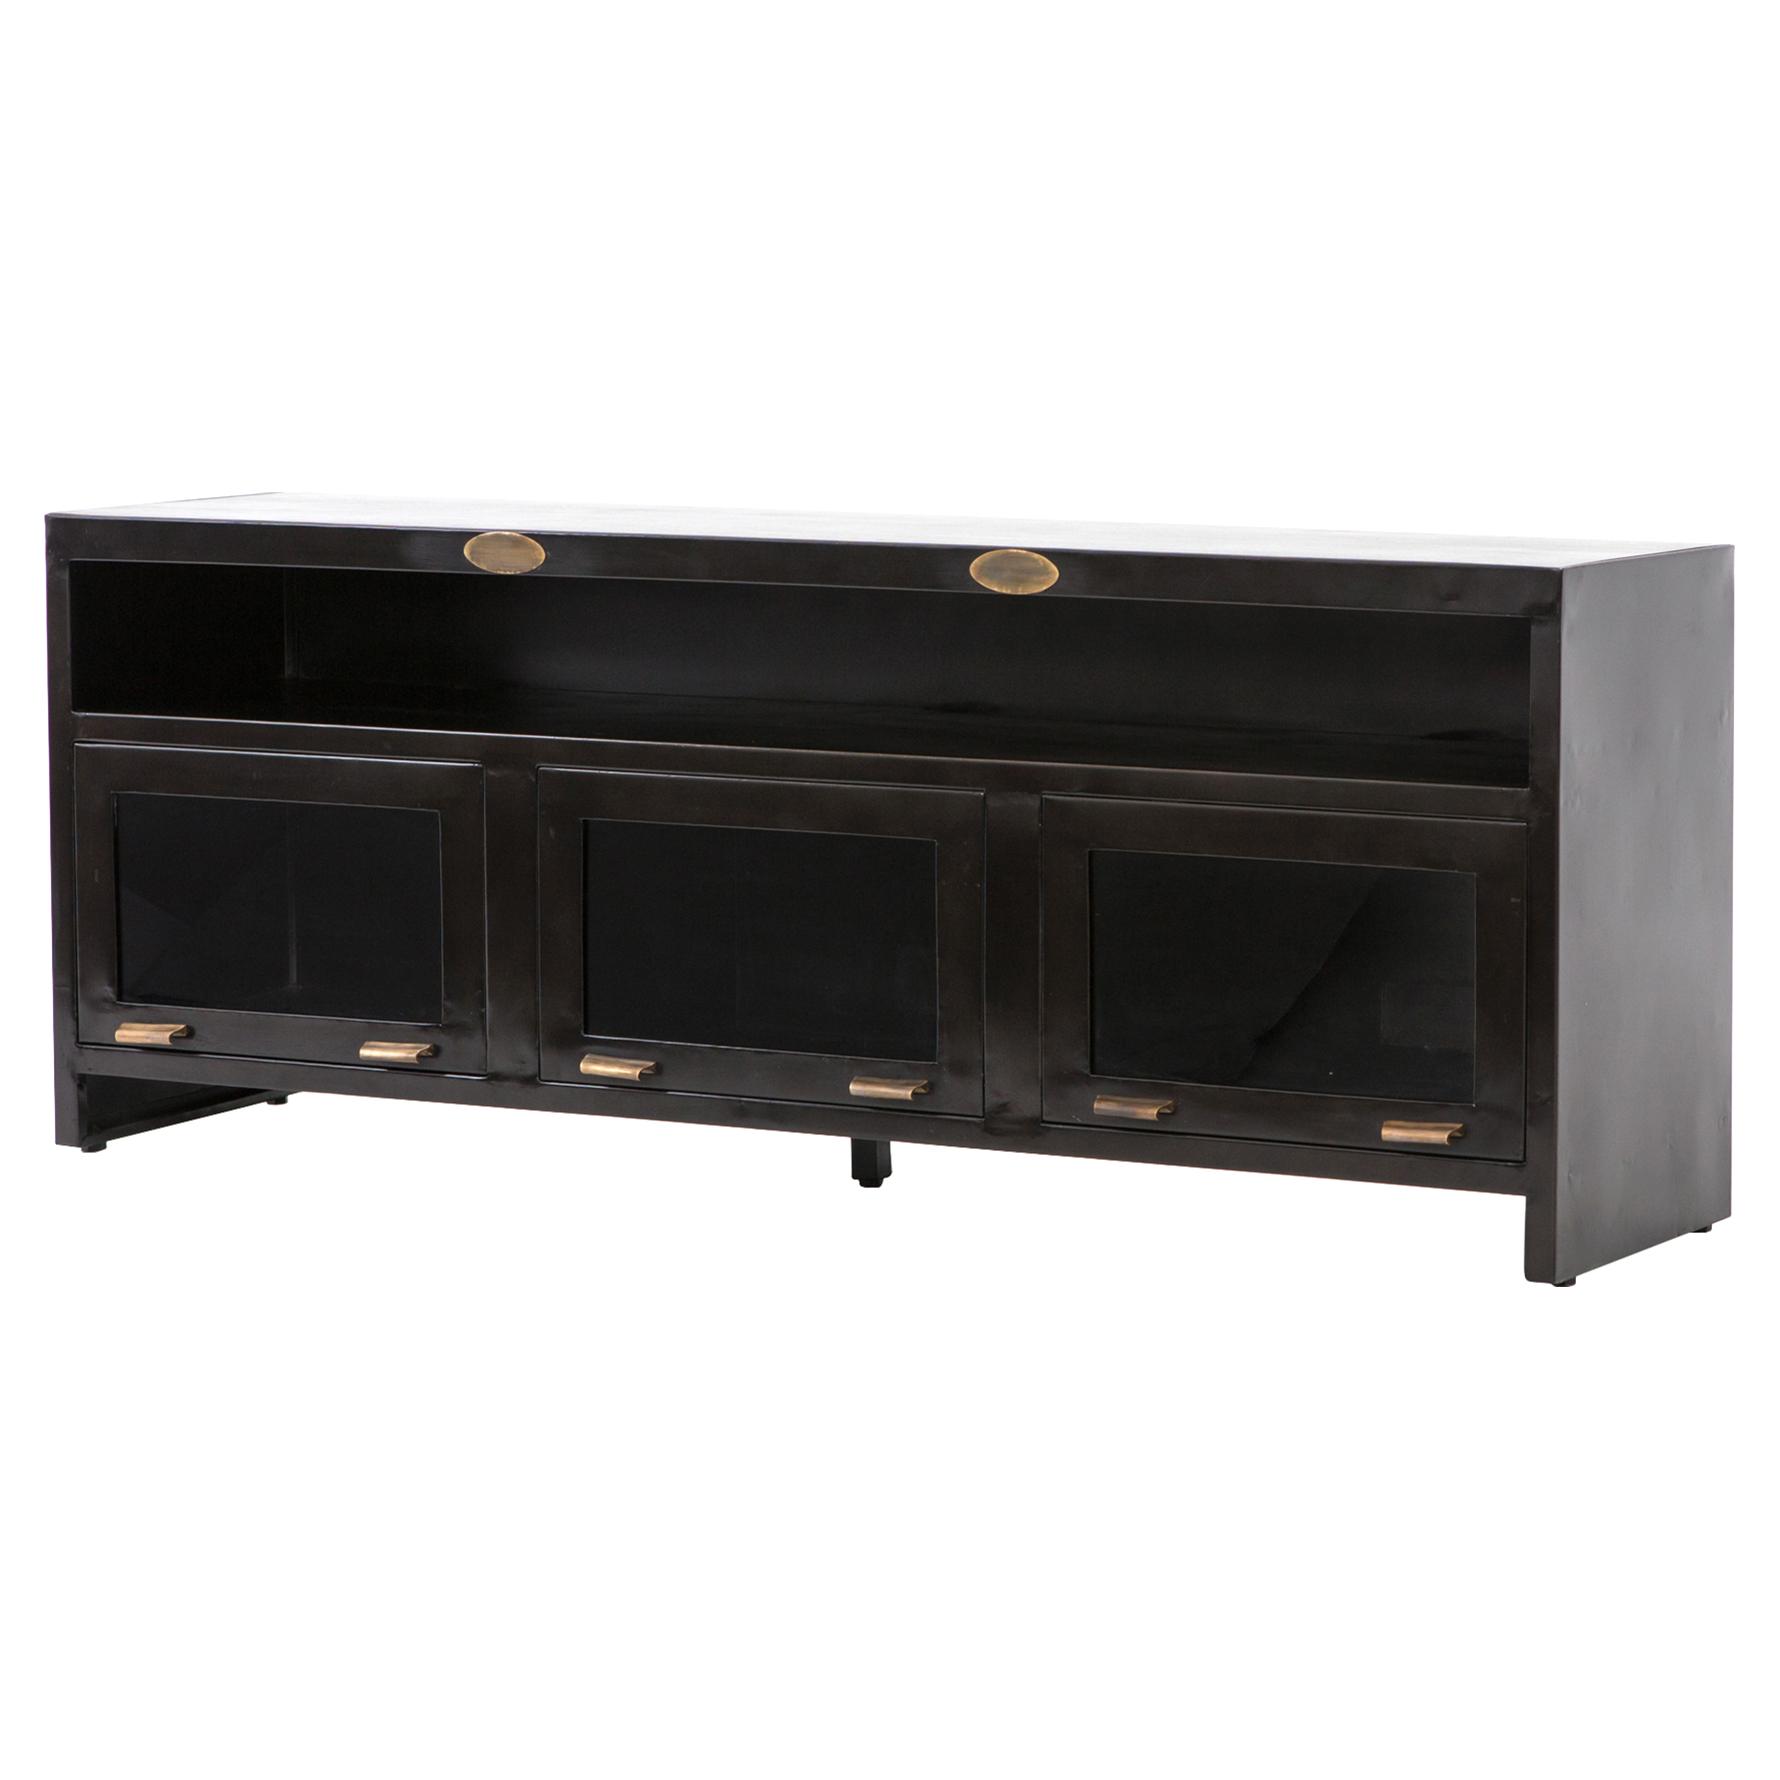 Fitz Industrial Loft Dark Brown 3 Cabinet Metal Media Cabinet